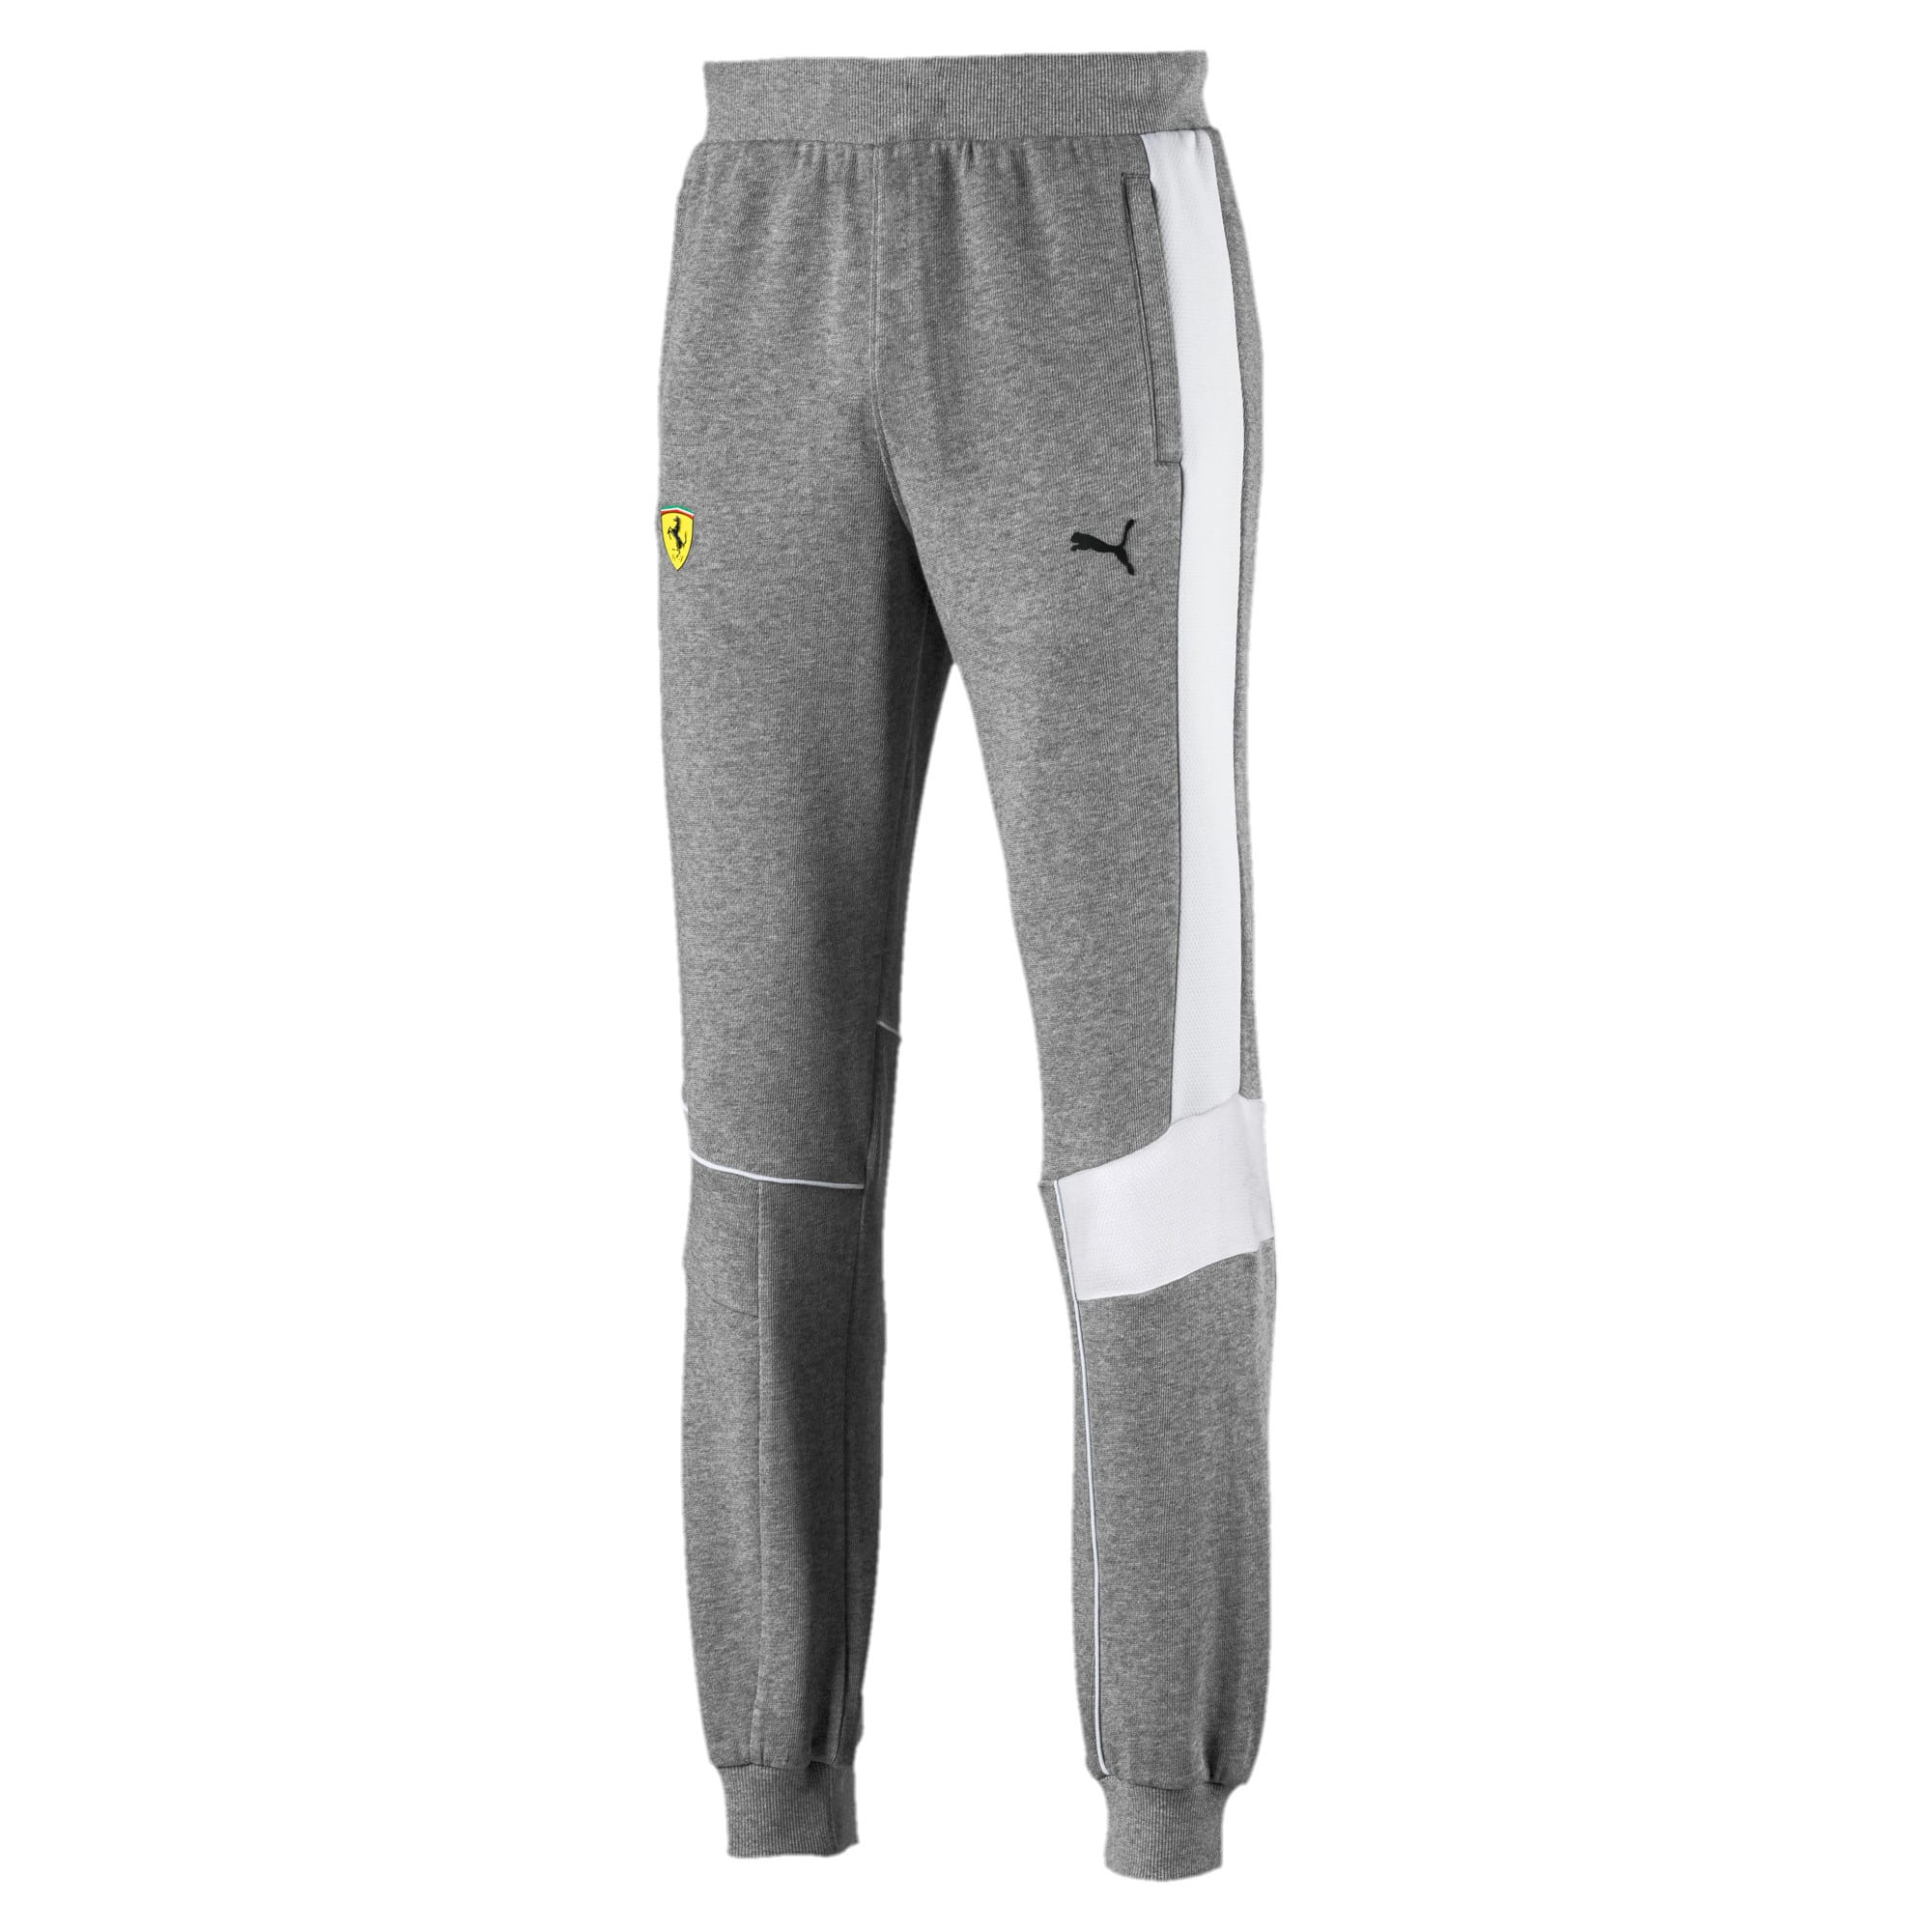 Thumbnail 4 of Ferrari Knitted Men's Sweatpants, Medium Gray Heather, medium-IND